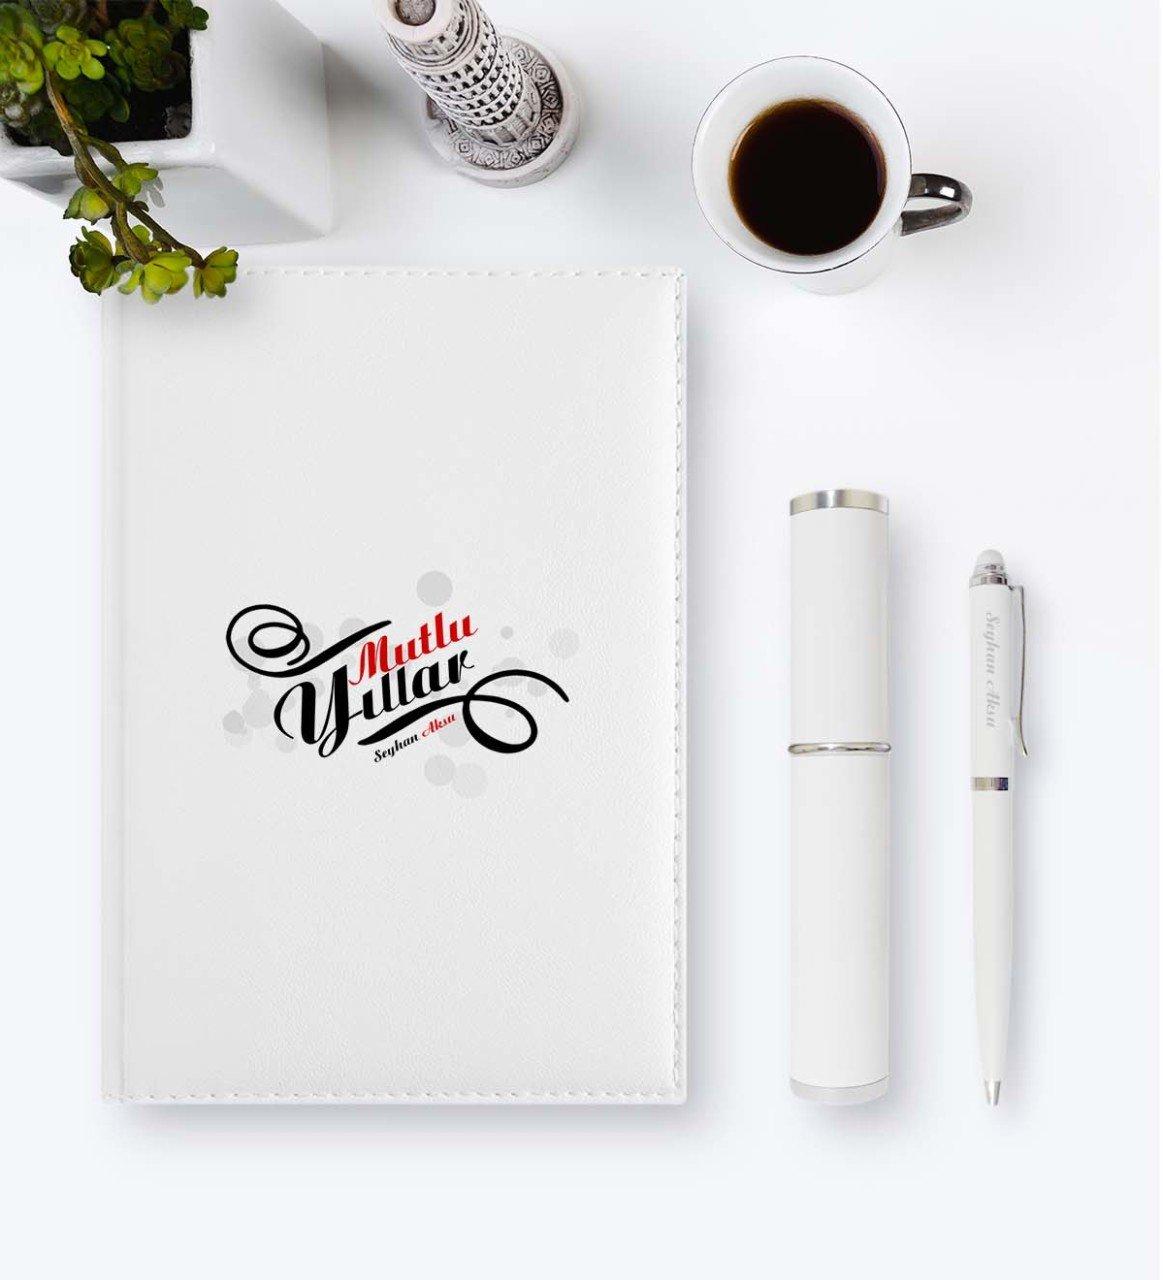 Personalized Happy birthday 2020 Leather Organizer & Pen Gift Set-3